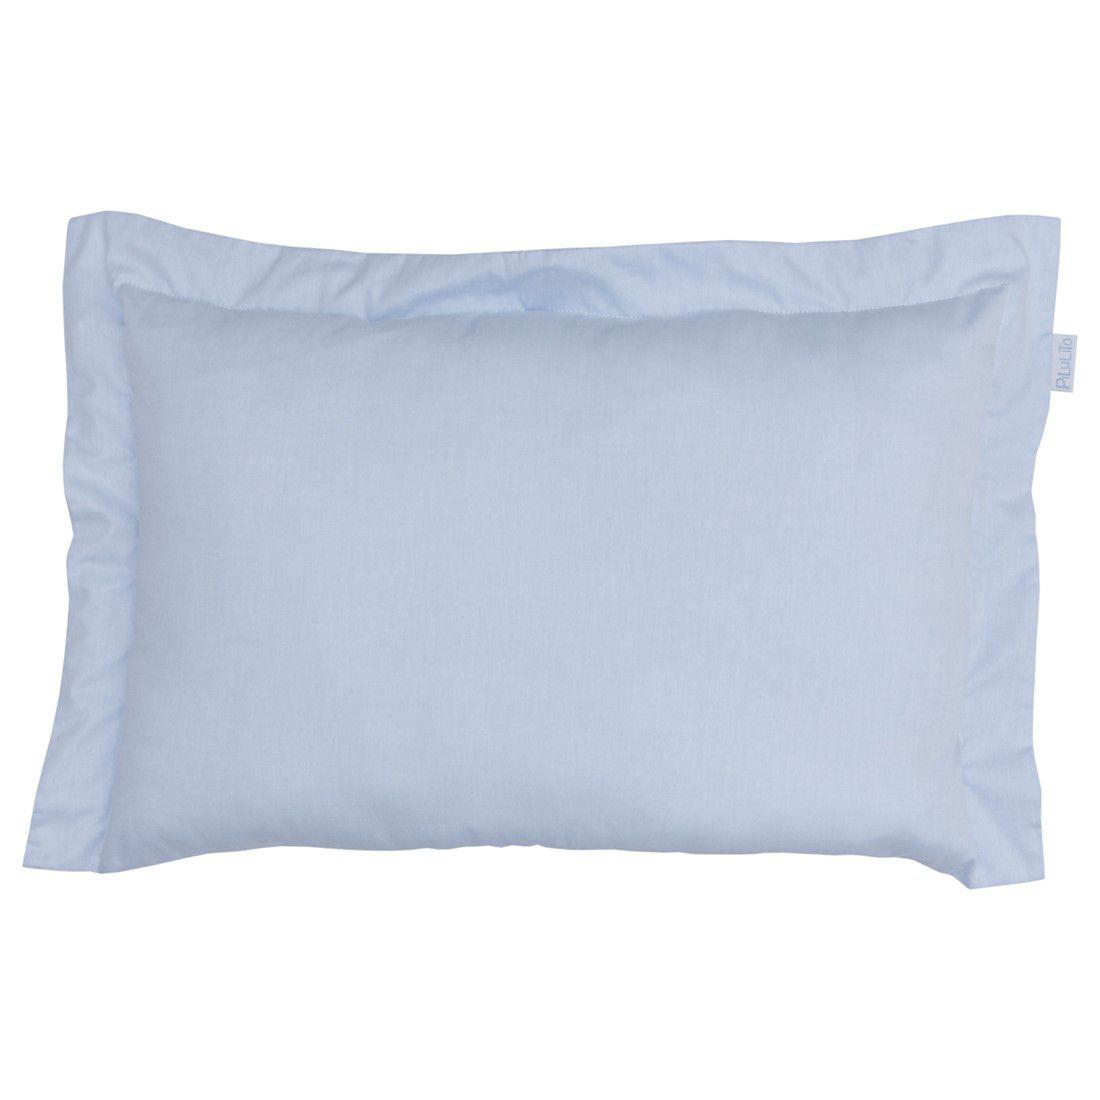 Capa de almofada de cabeceira 60x40cm azul céu